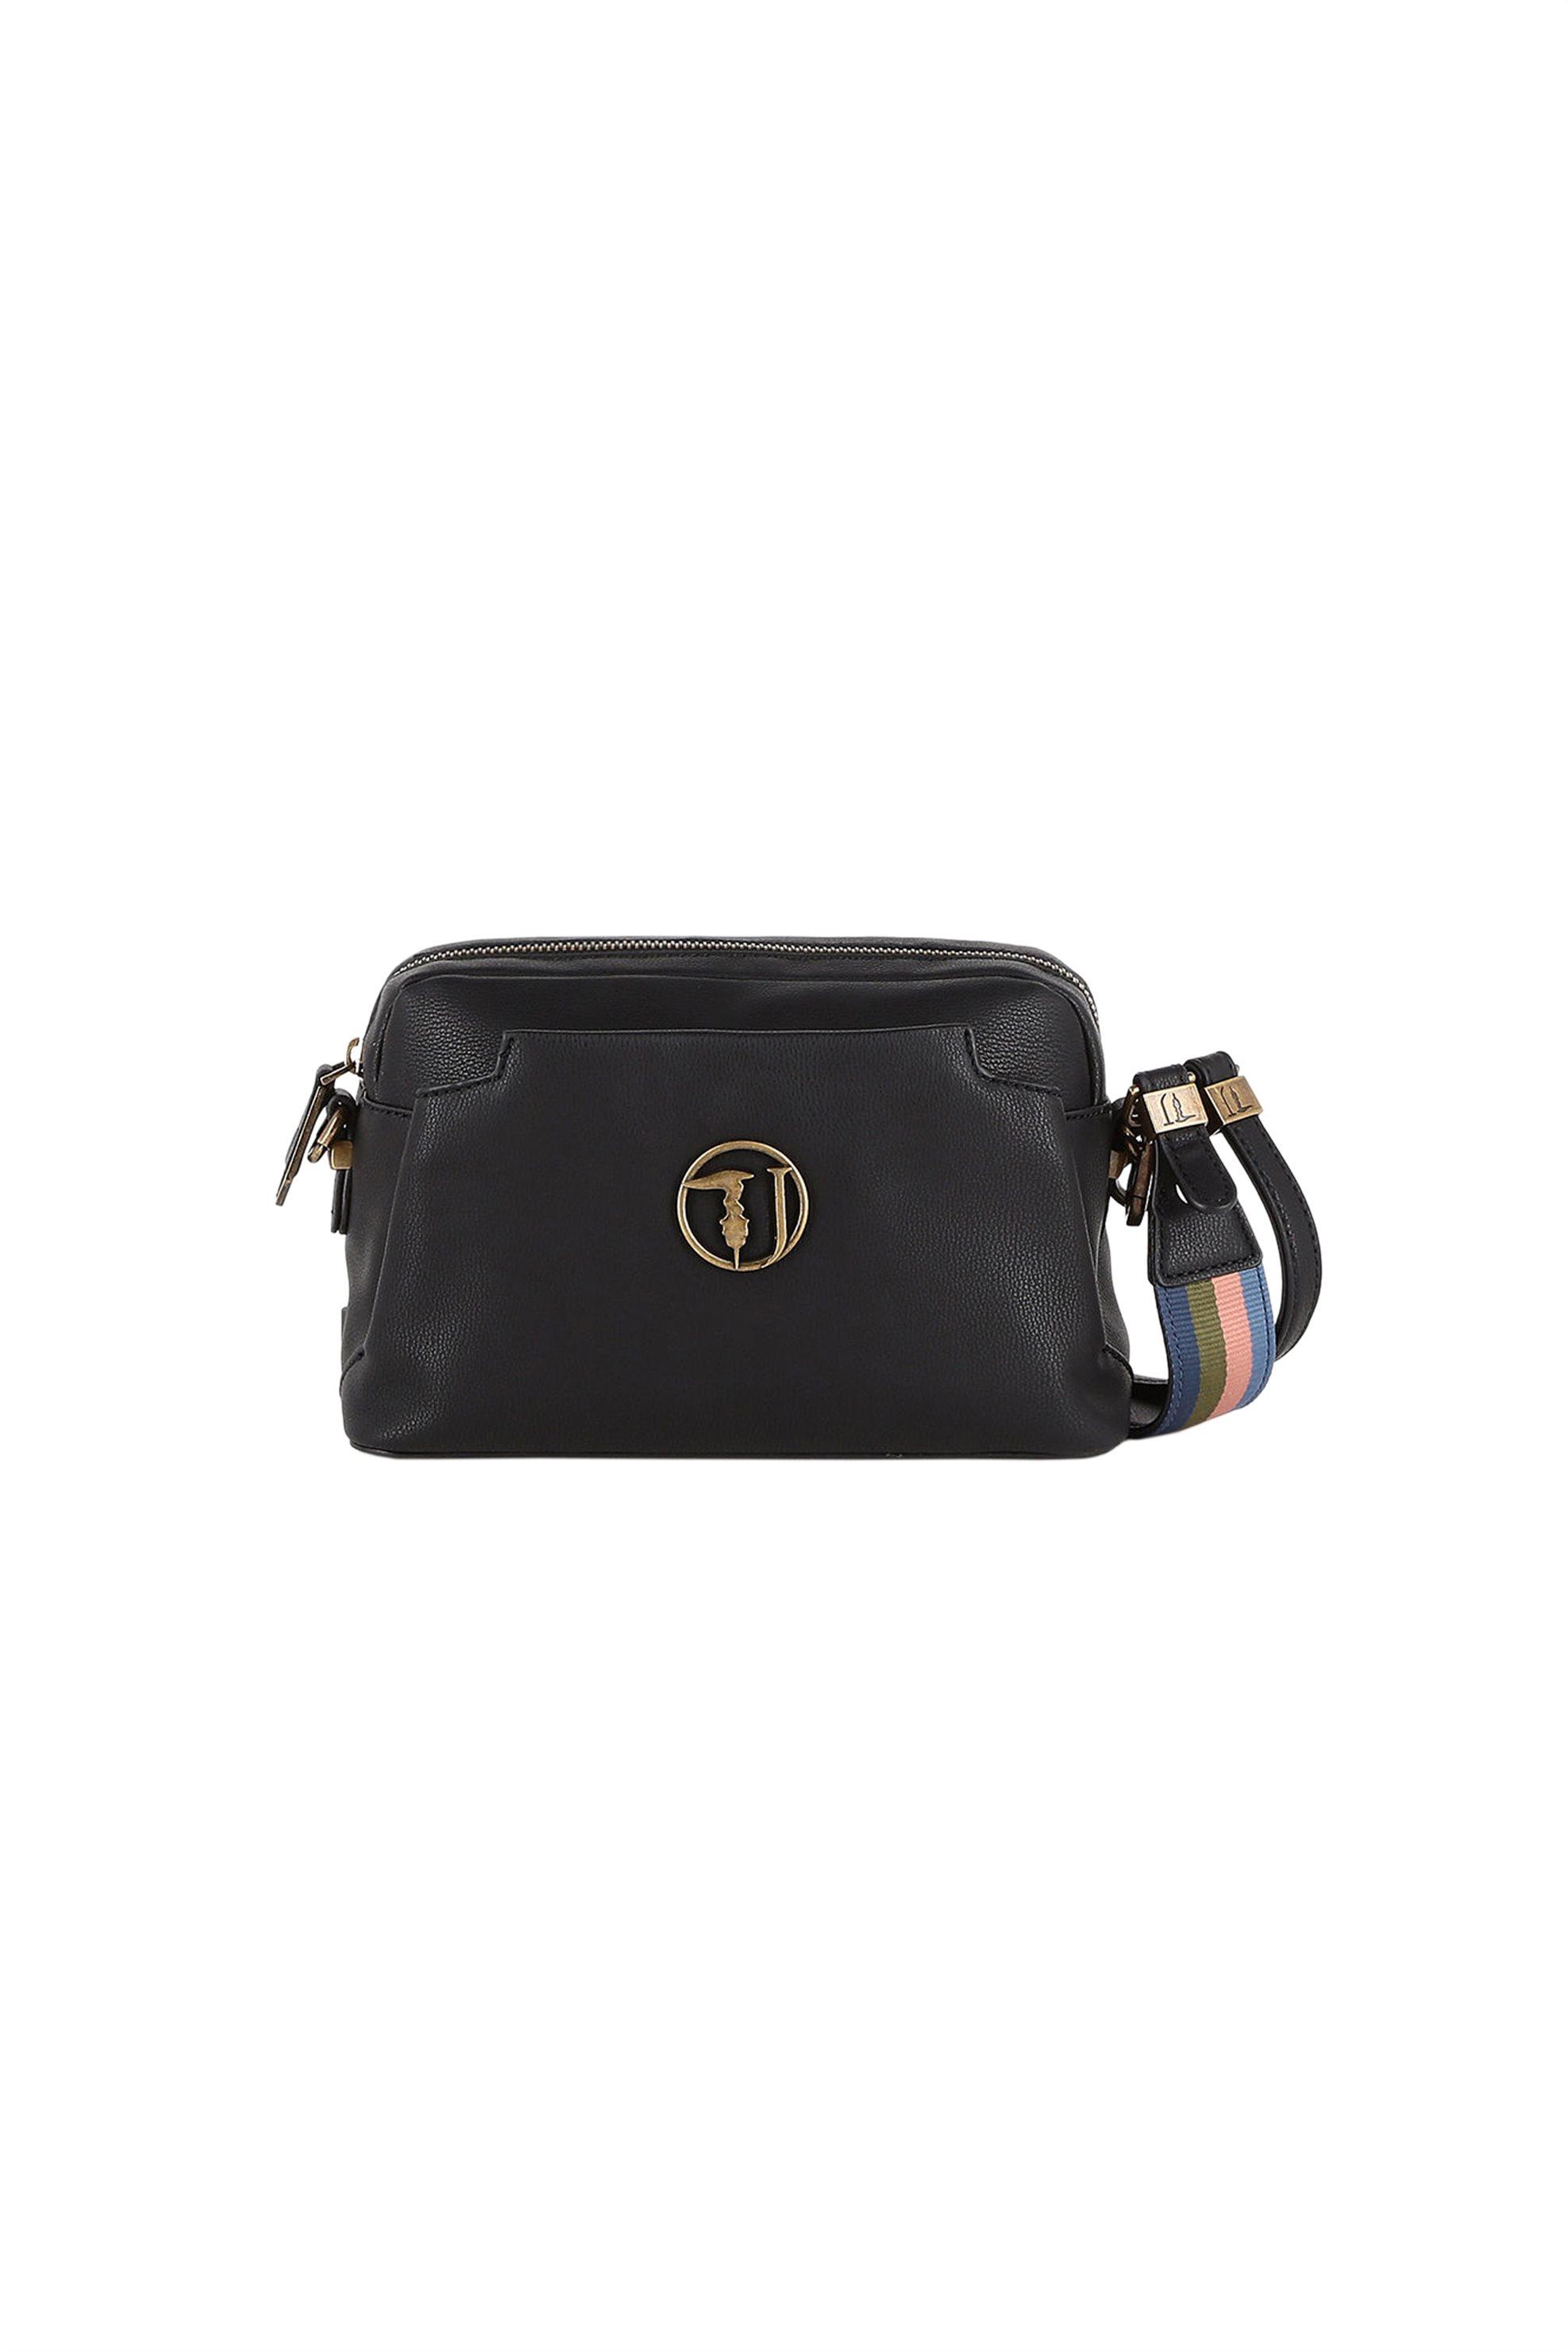 Trussardi Jeans γυναικείο mini bag Rabarbaro - 75B00433-9Y099999 - Μαύρο γυναικα   τσαντεσ   mini bags